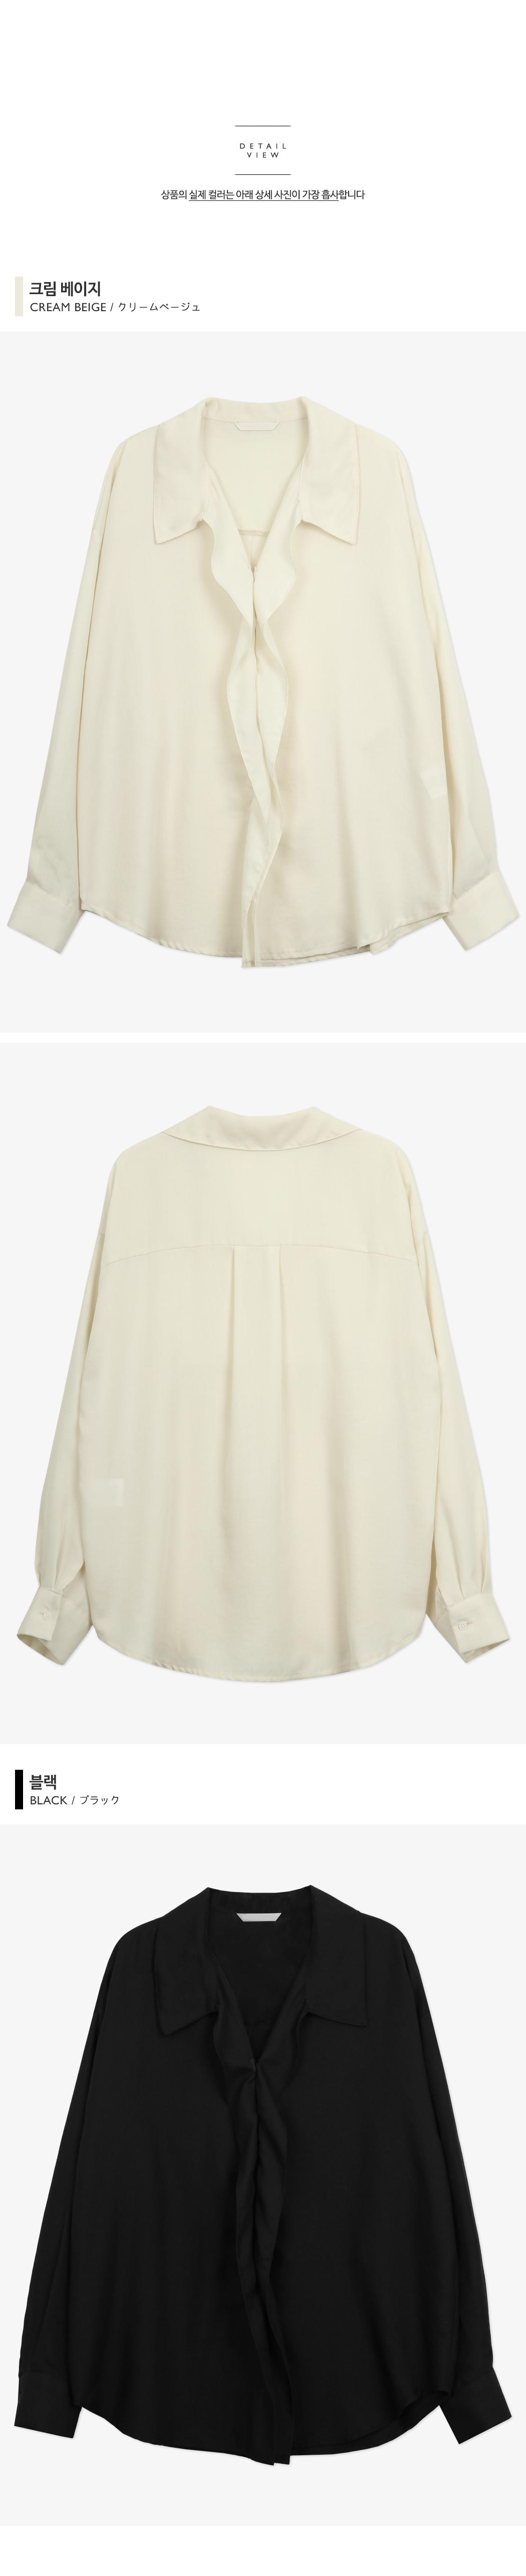 Tasha frillline blouse